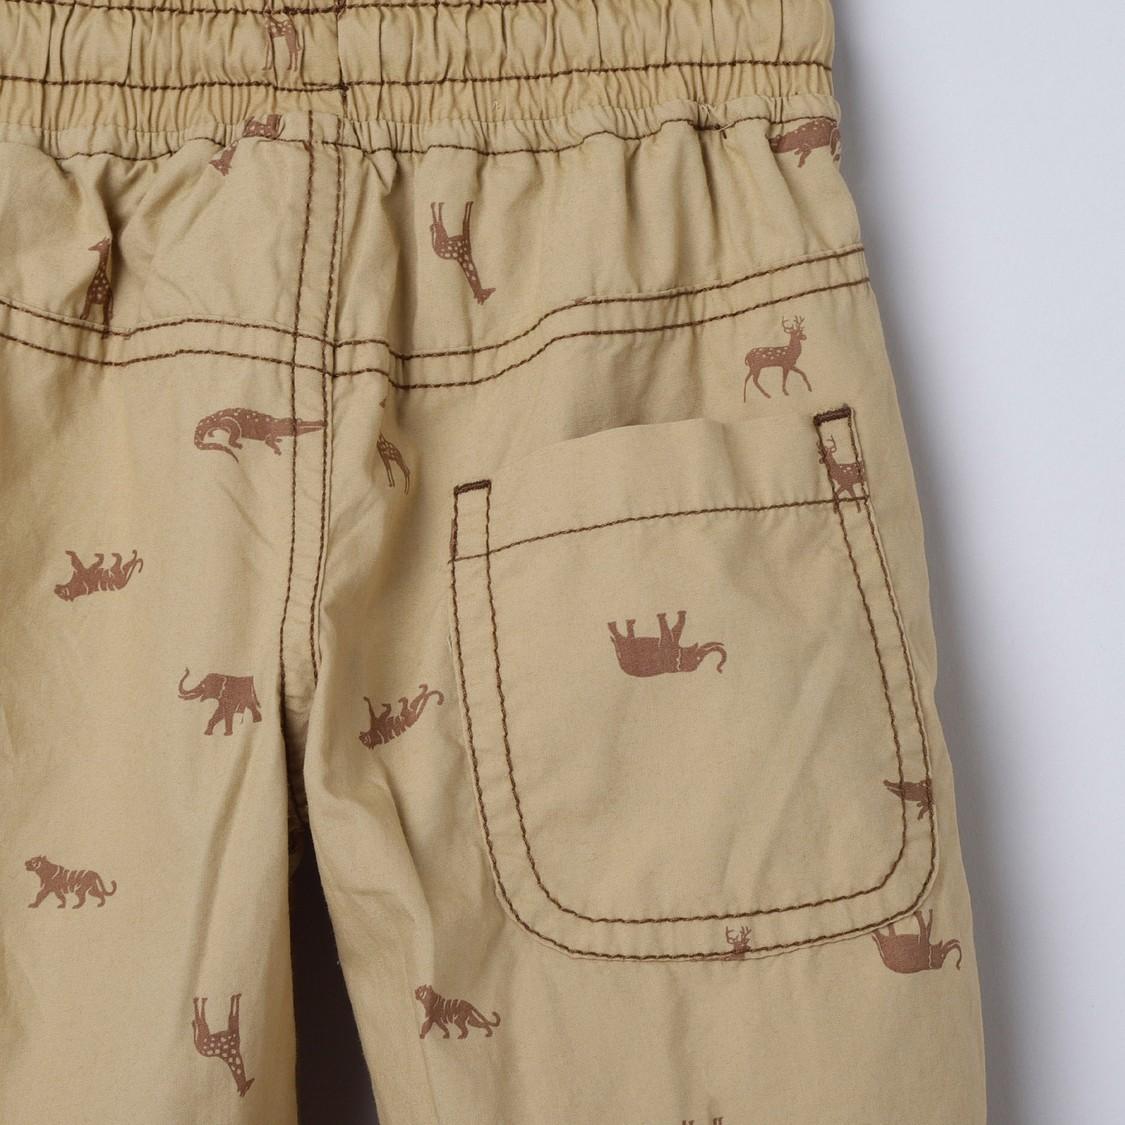 MAX Printed Drawstring Waist Trousers